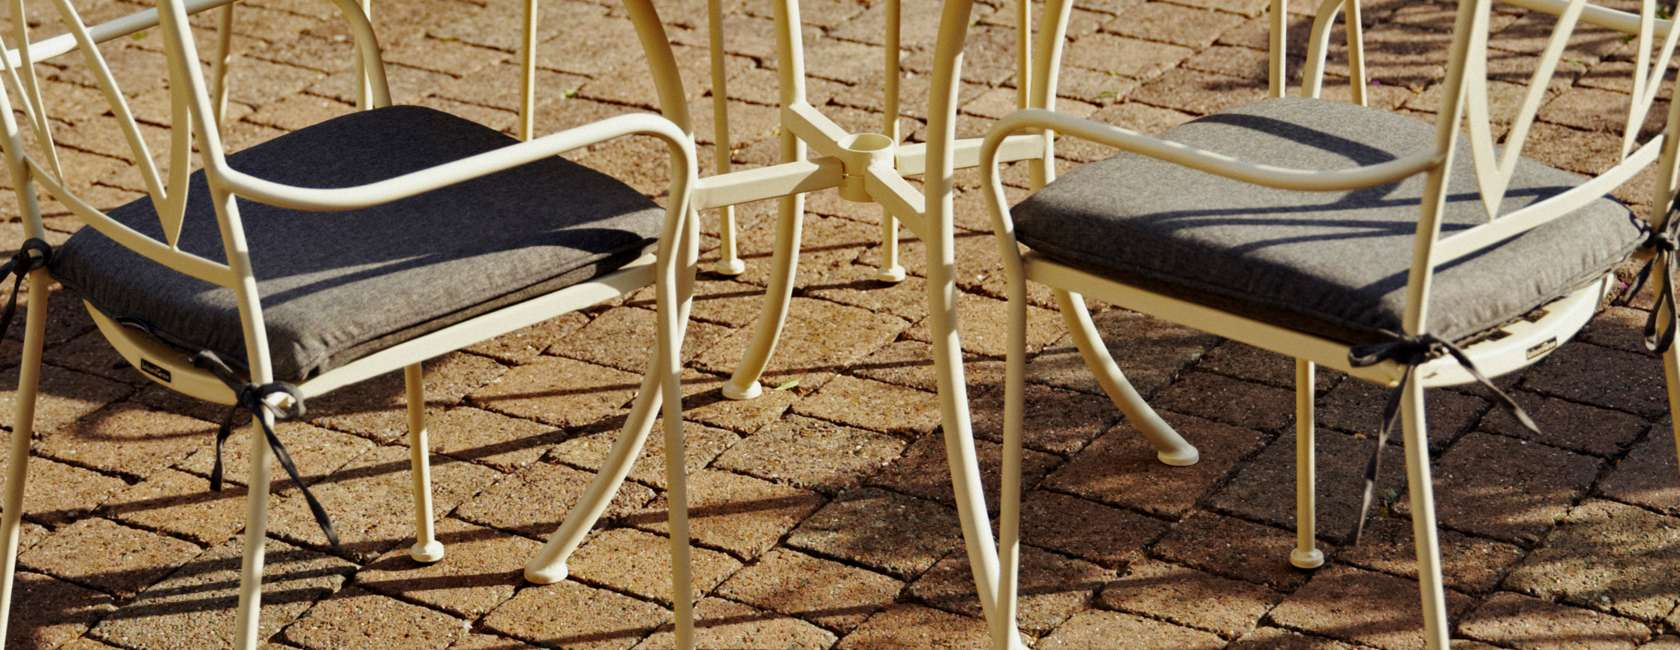 LG Outdoor Marrakech Outdoor Furniture at John Lewis & Partners